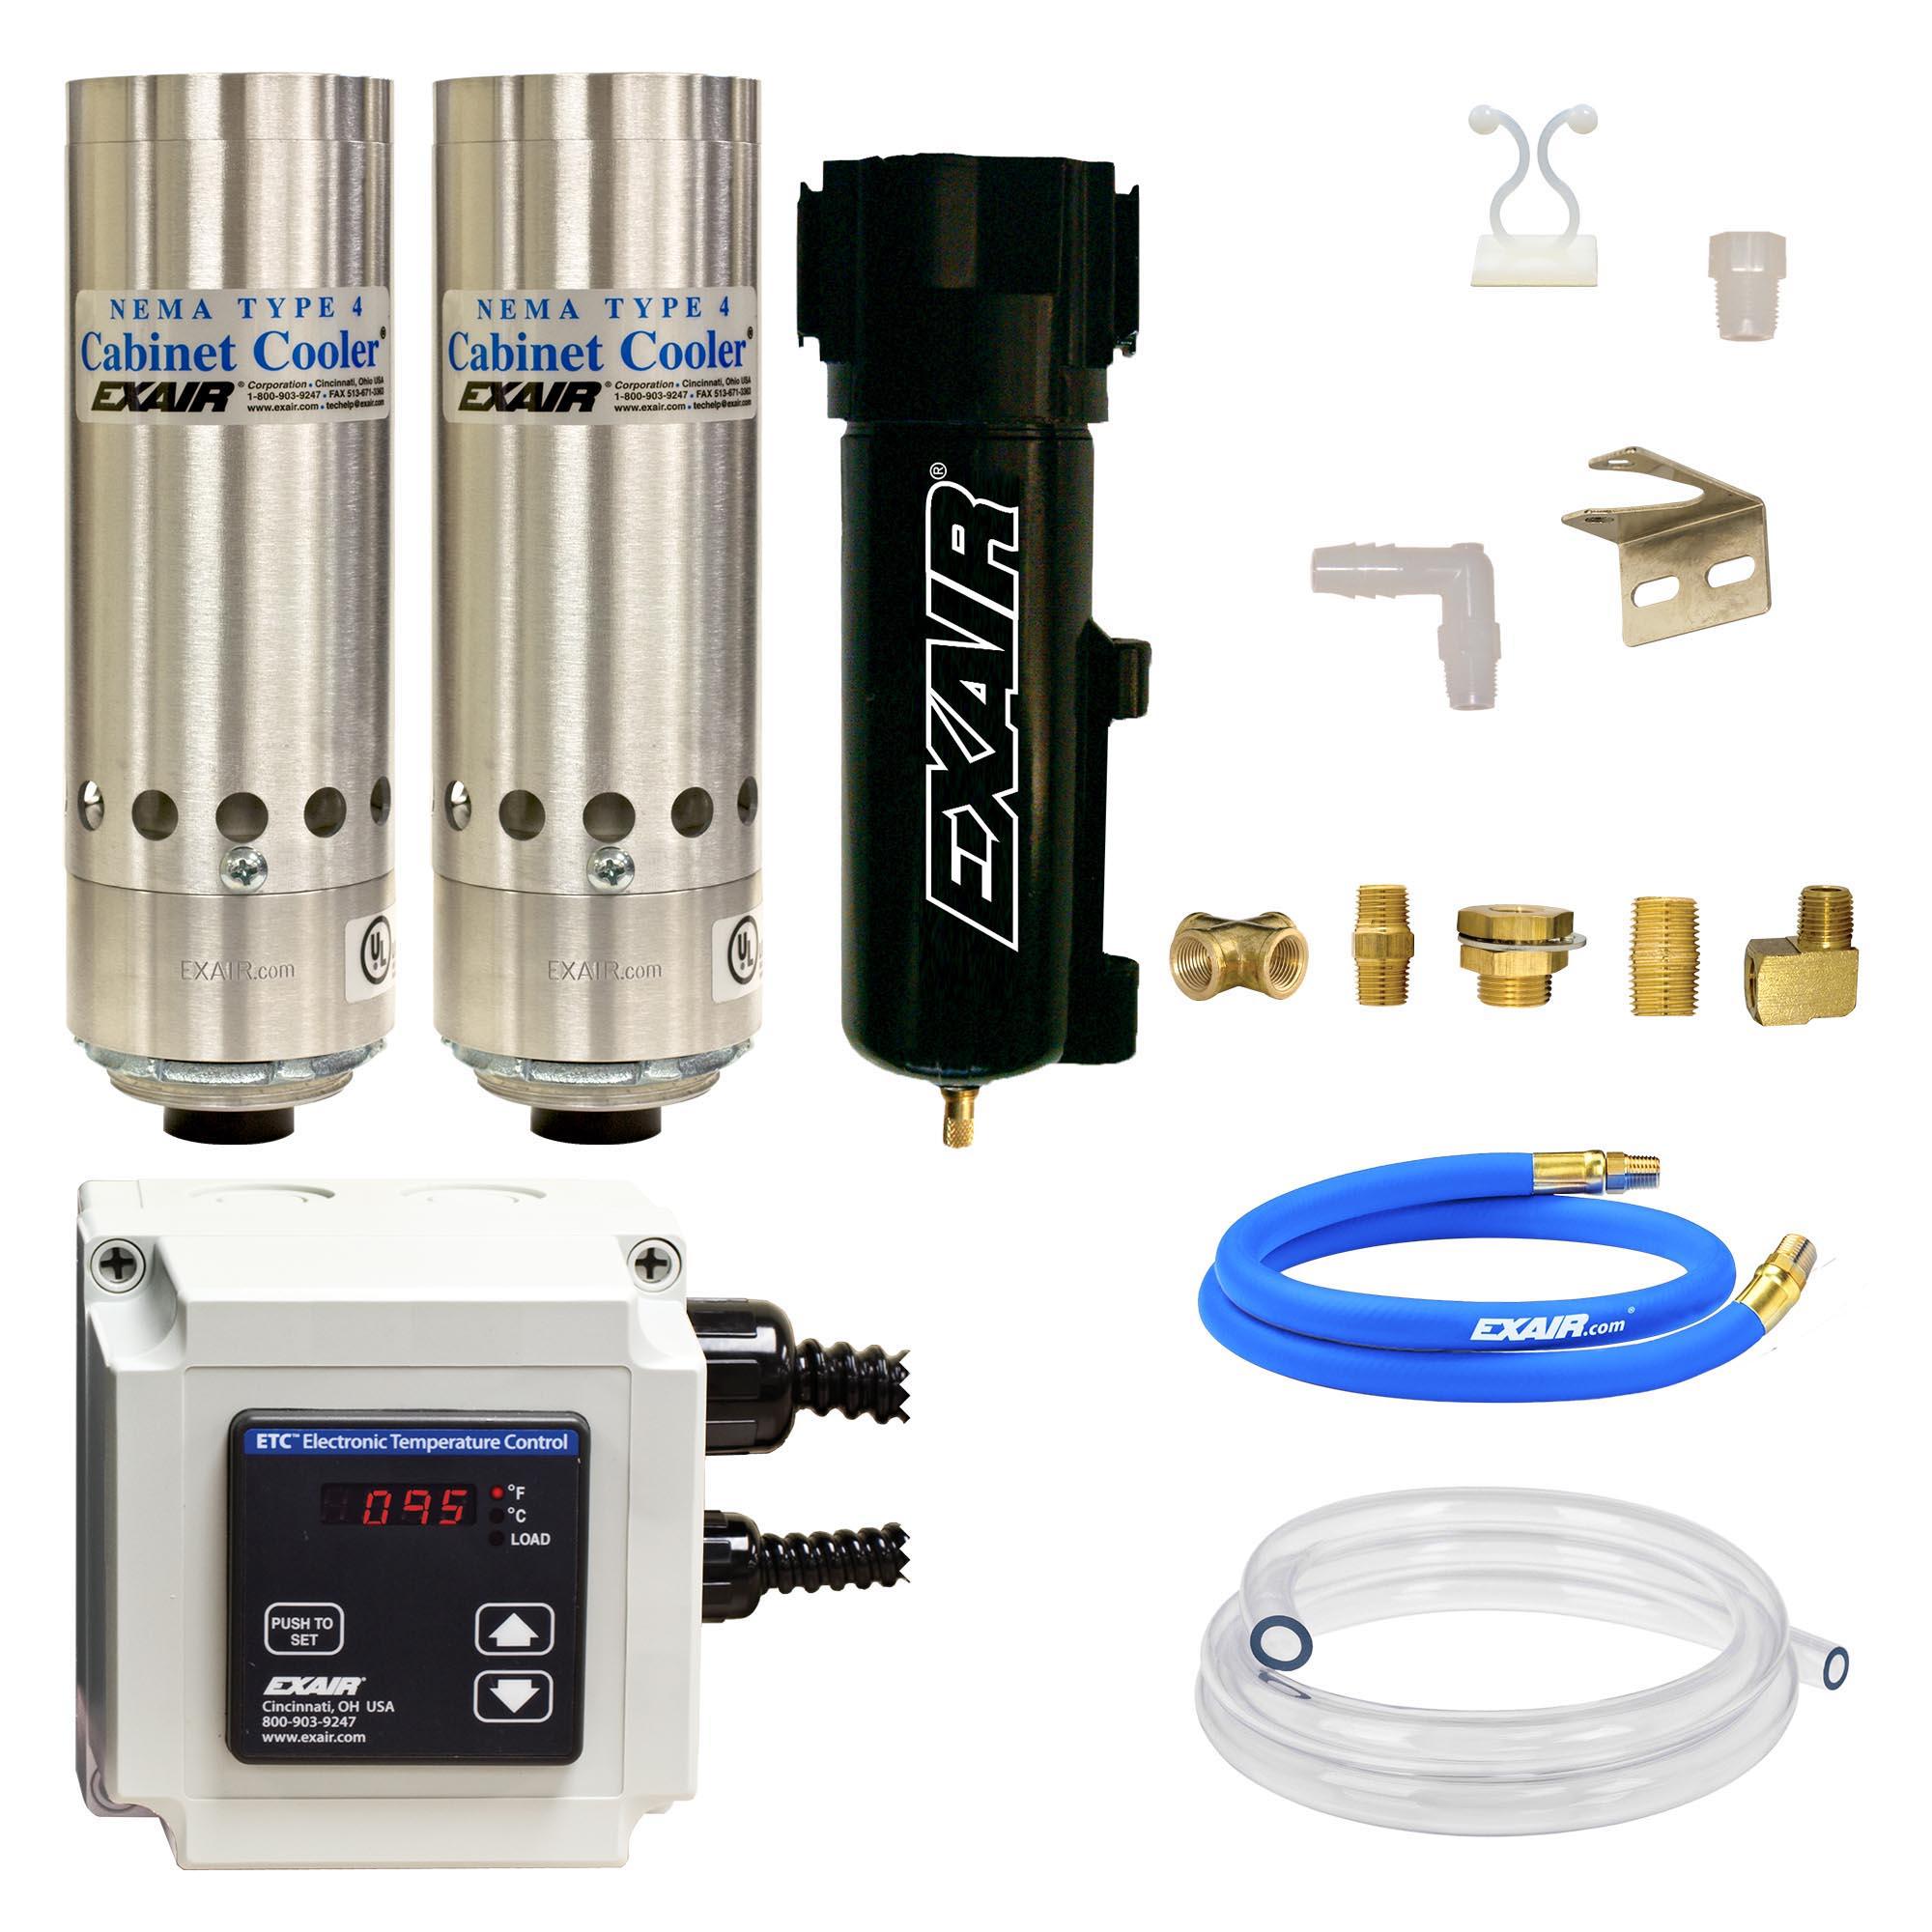 Model W4870-ETC120 NEMA 4 4,800 Btu/hr Cabinet Cooler System with ETC Thermostat Control, 120V